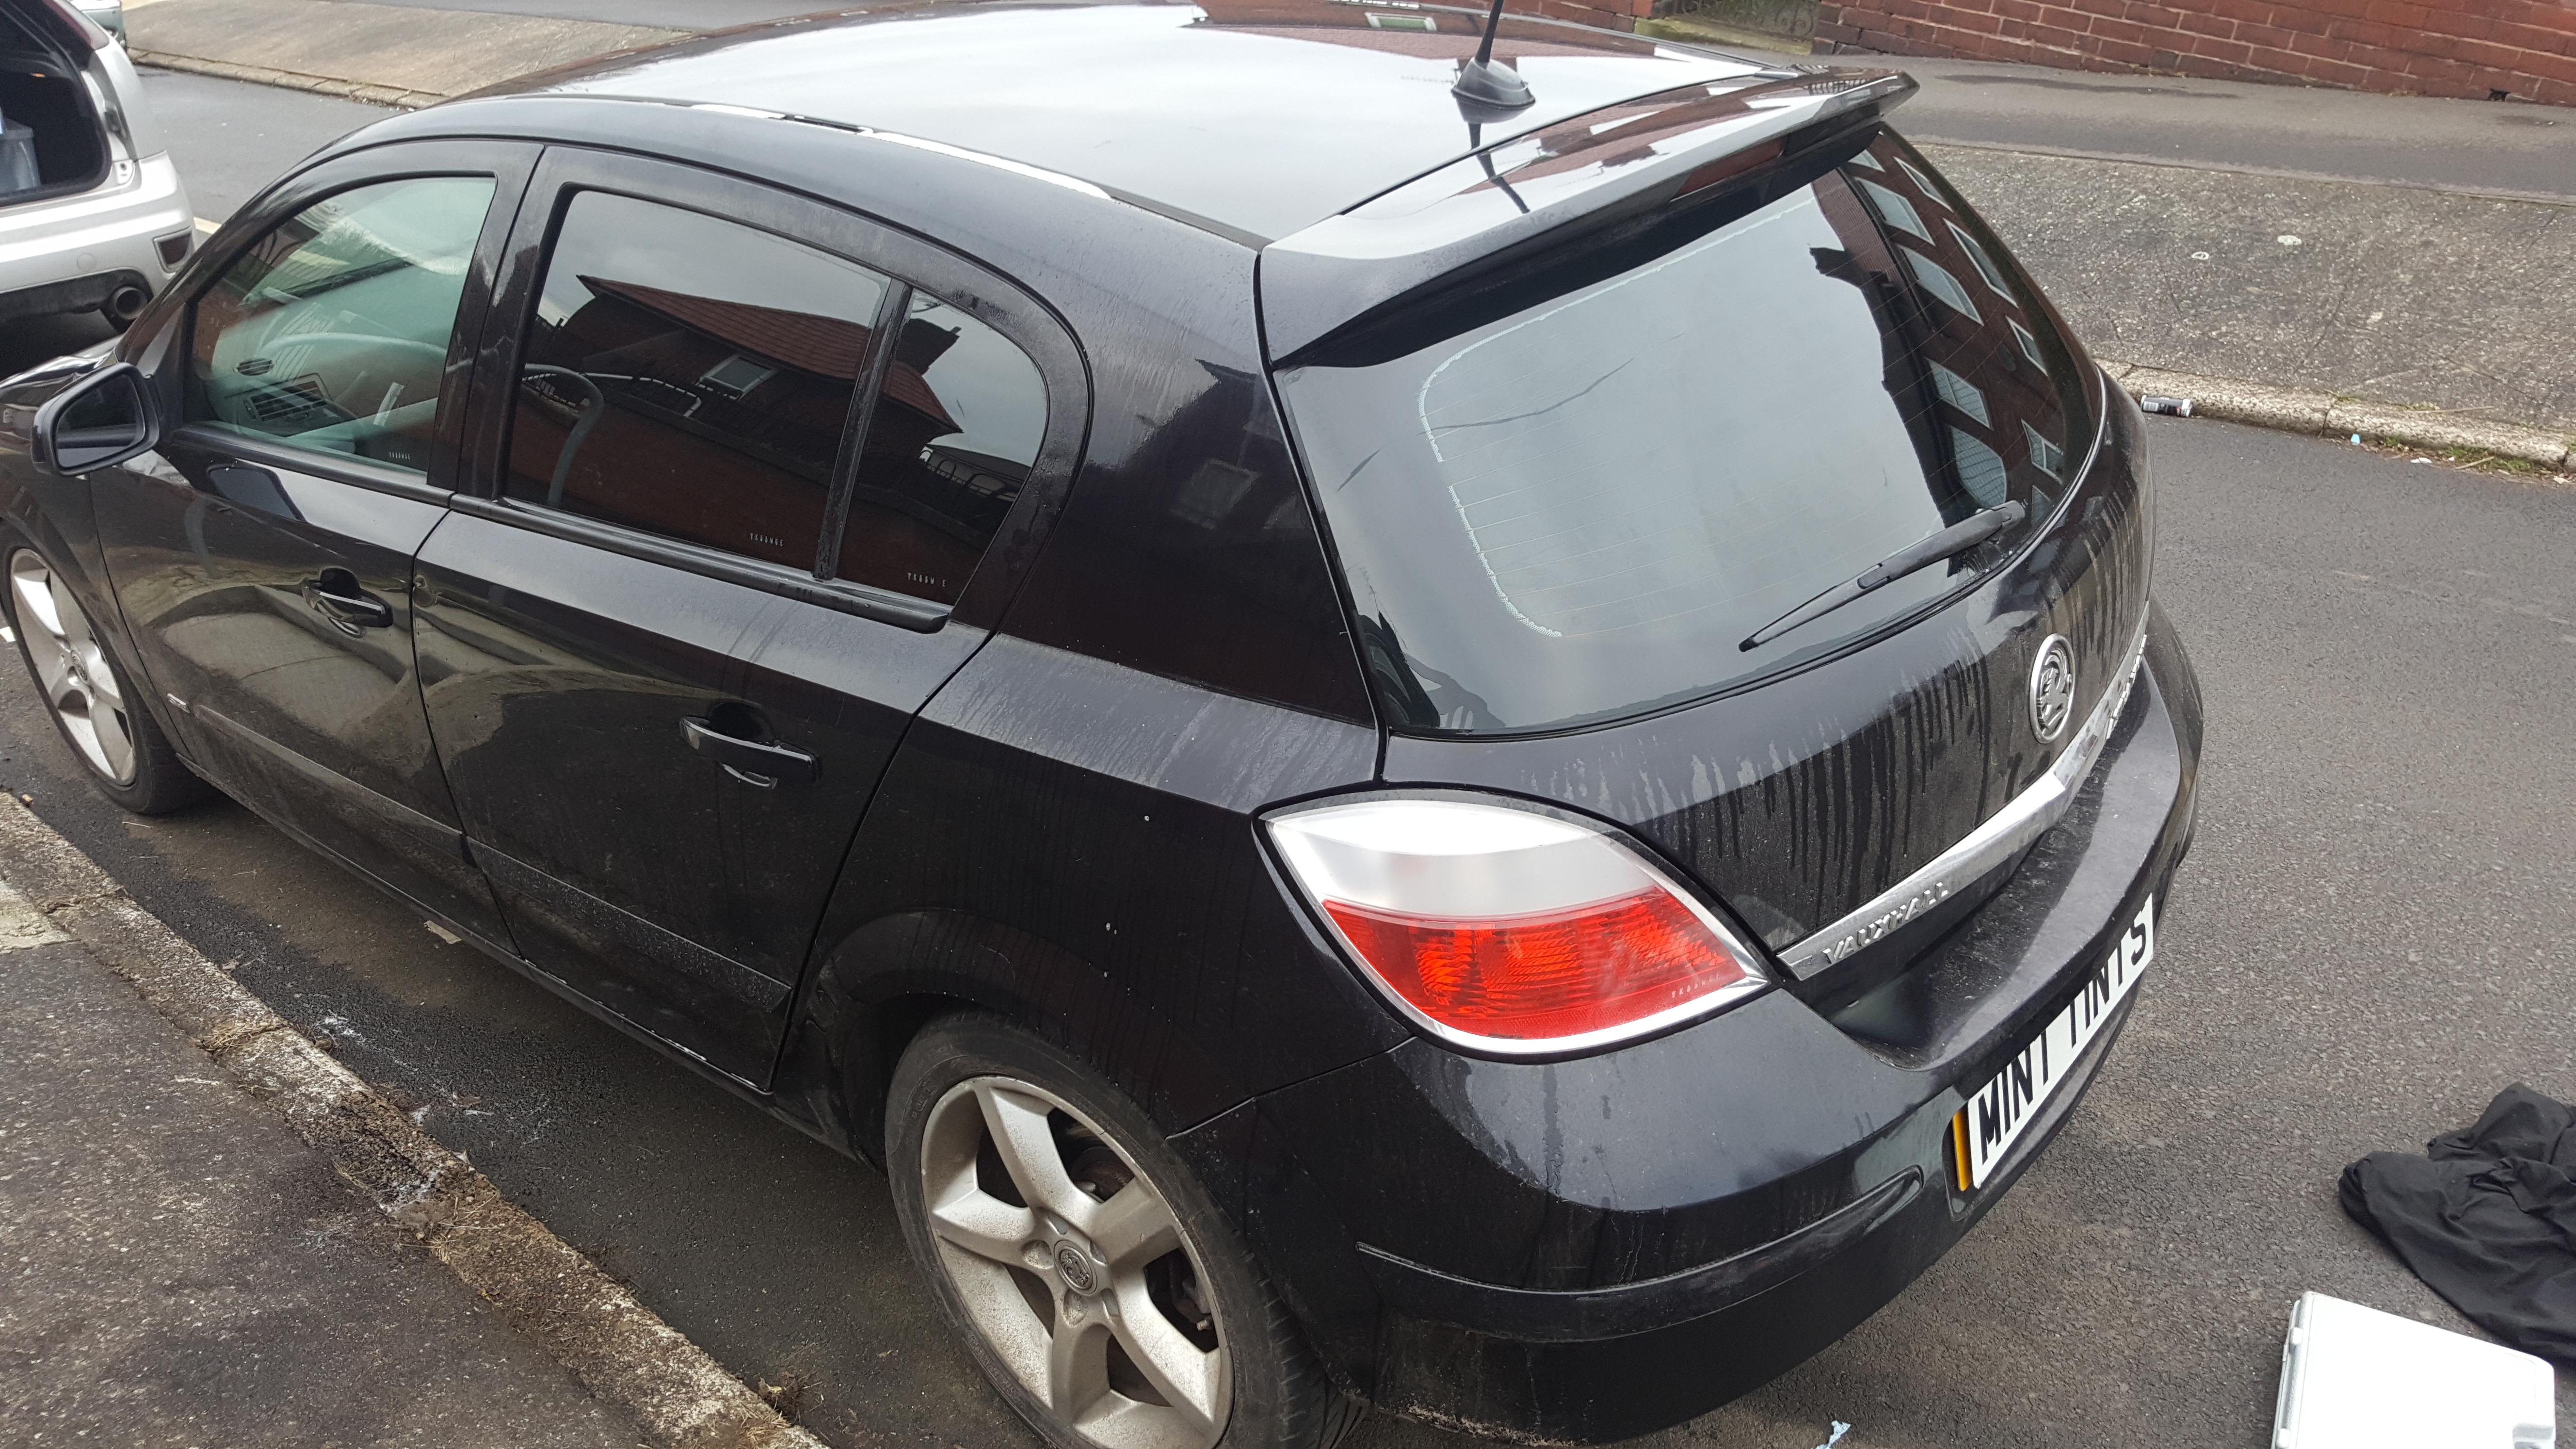 Vauxhall Astra - 5% Limo Black Tint